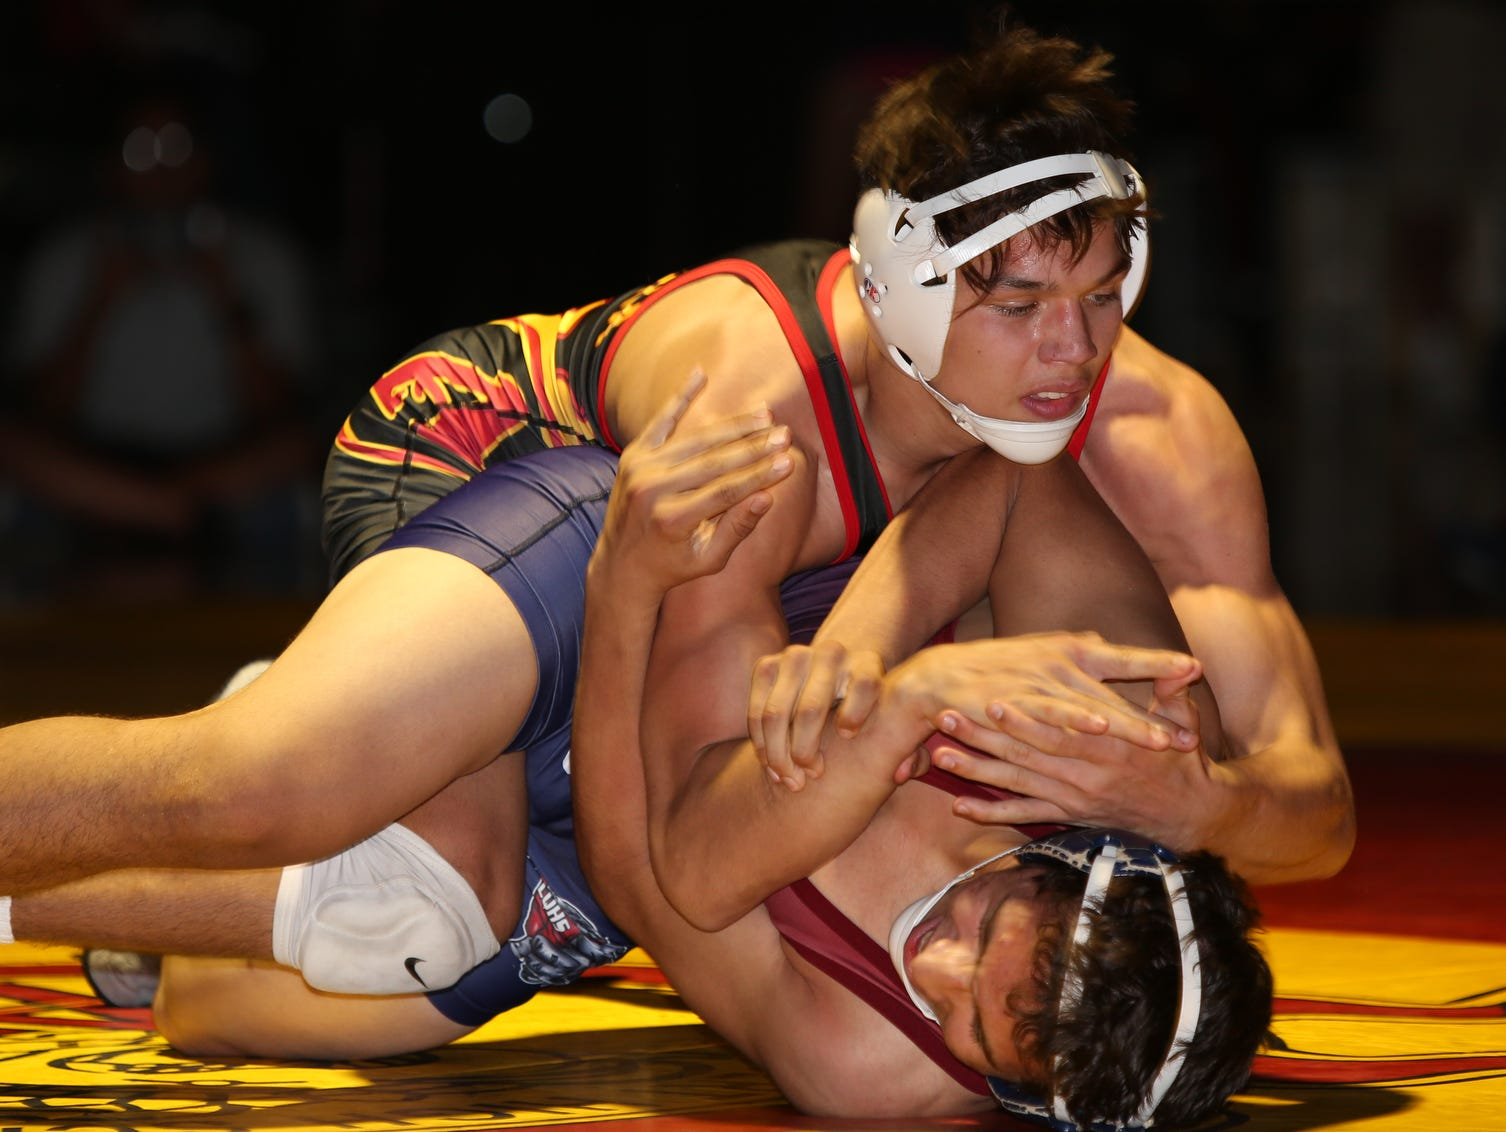 FILE - Palm Desert's Anthony Mantanona, top, wrestles La Quinta's Ruben Ponce during a match at Palm Desert High School on Thursday, January 29, 2015. Mantanona won.